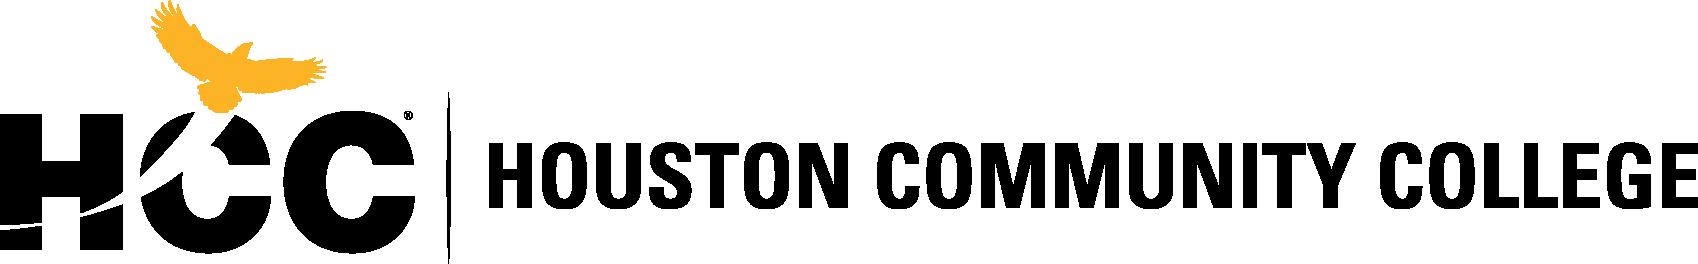 hcc-logo-black.png